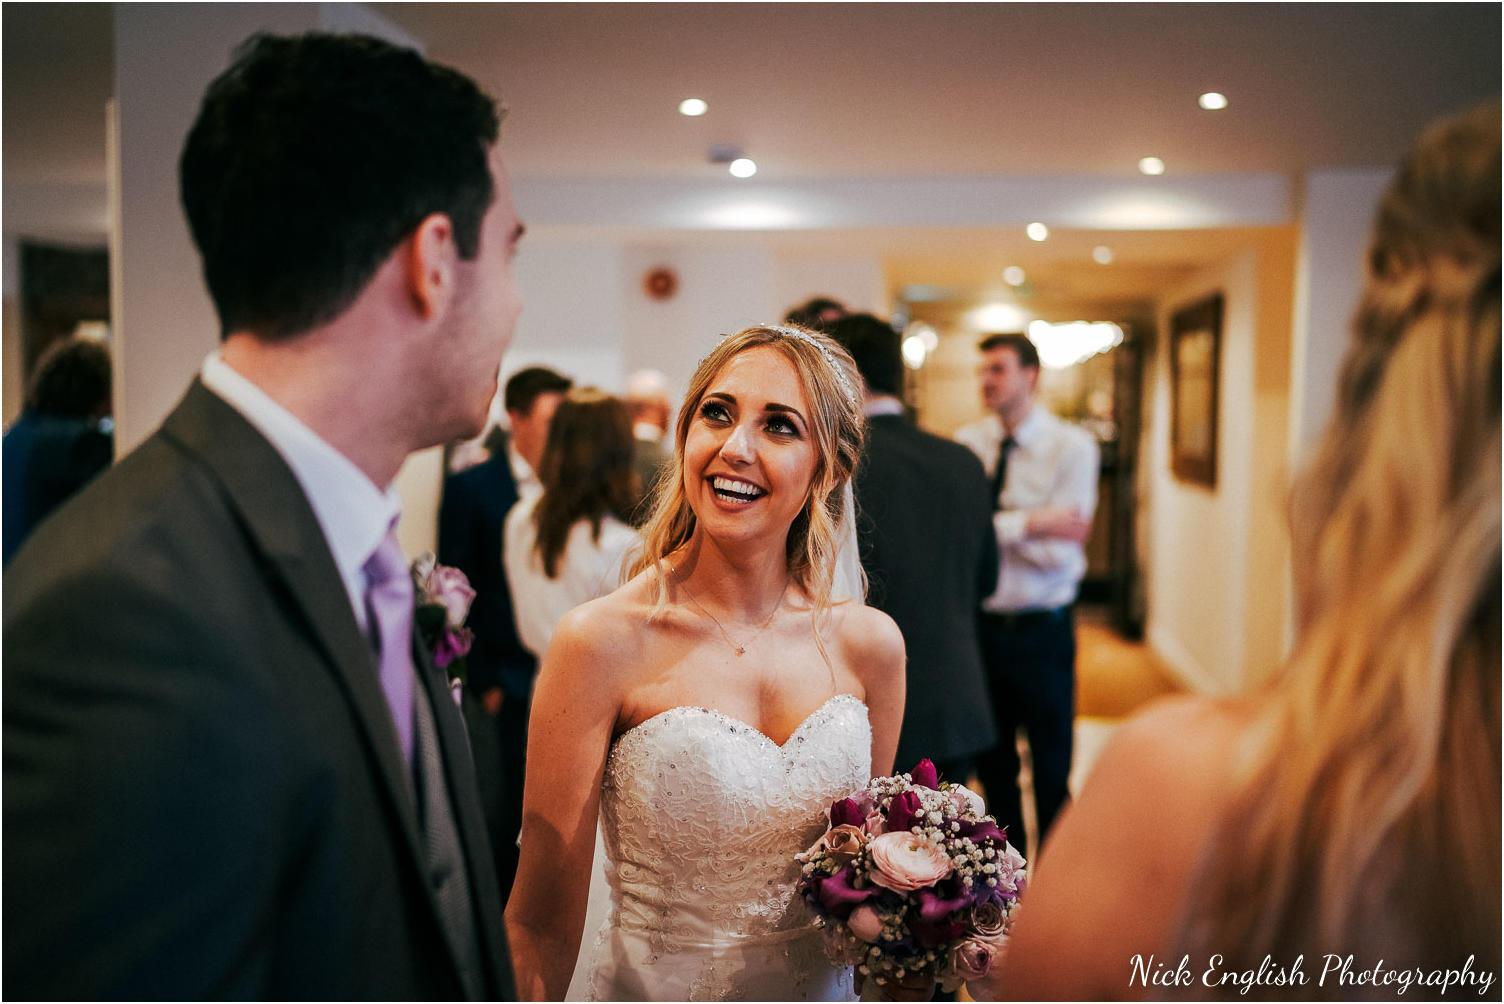 Mitton_Hall_Wedding_Photographer_2018-119.jpg